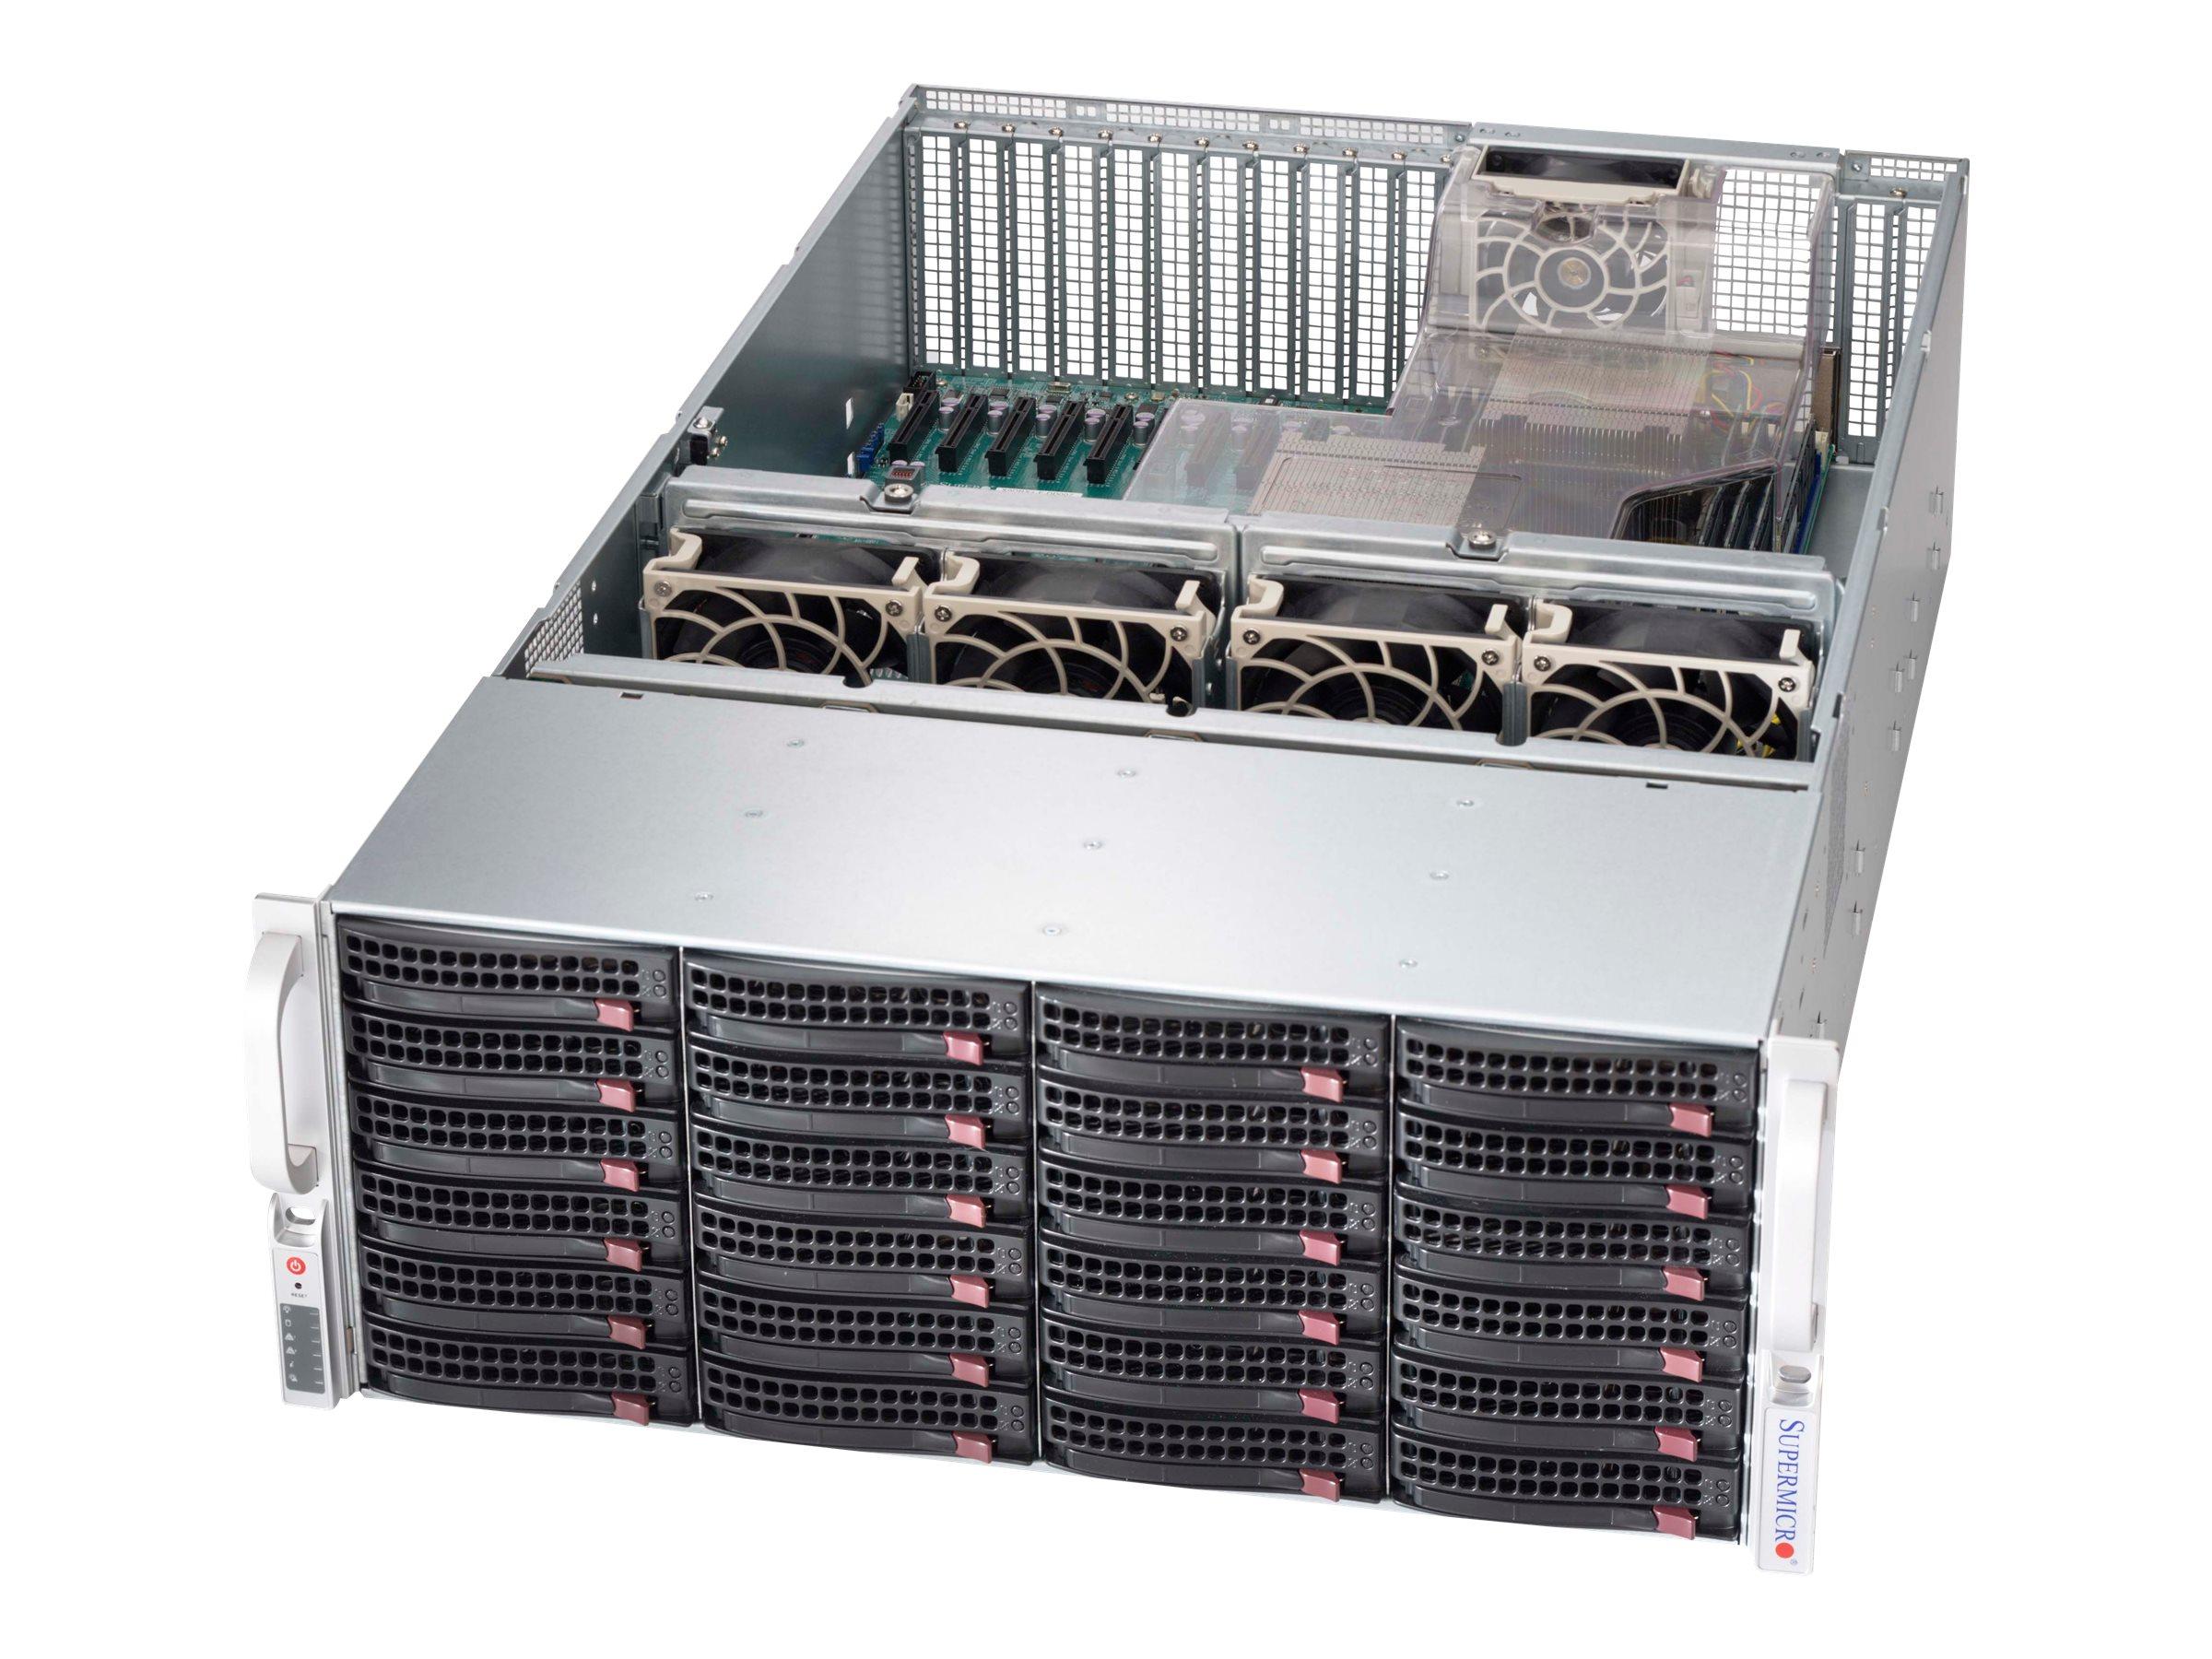 Supermicro SC846 XE2C-R1K23B - Rack - einbaufähig - 4U - Erweitertes ATX - SAS